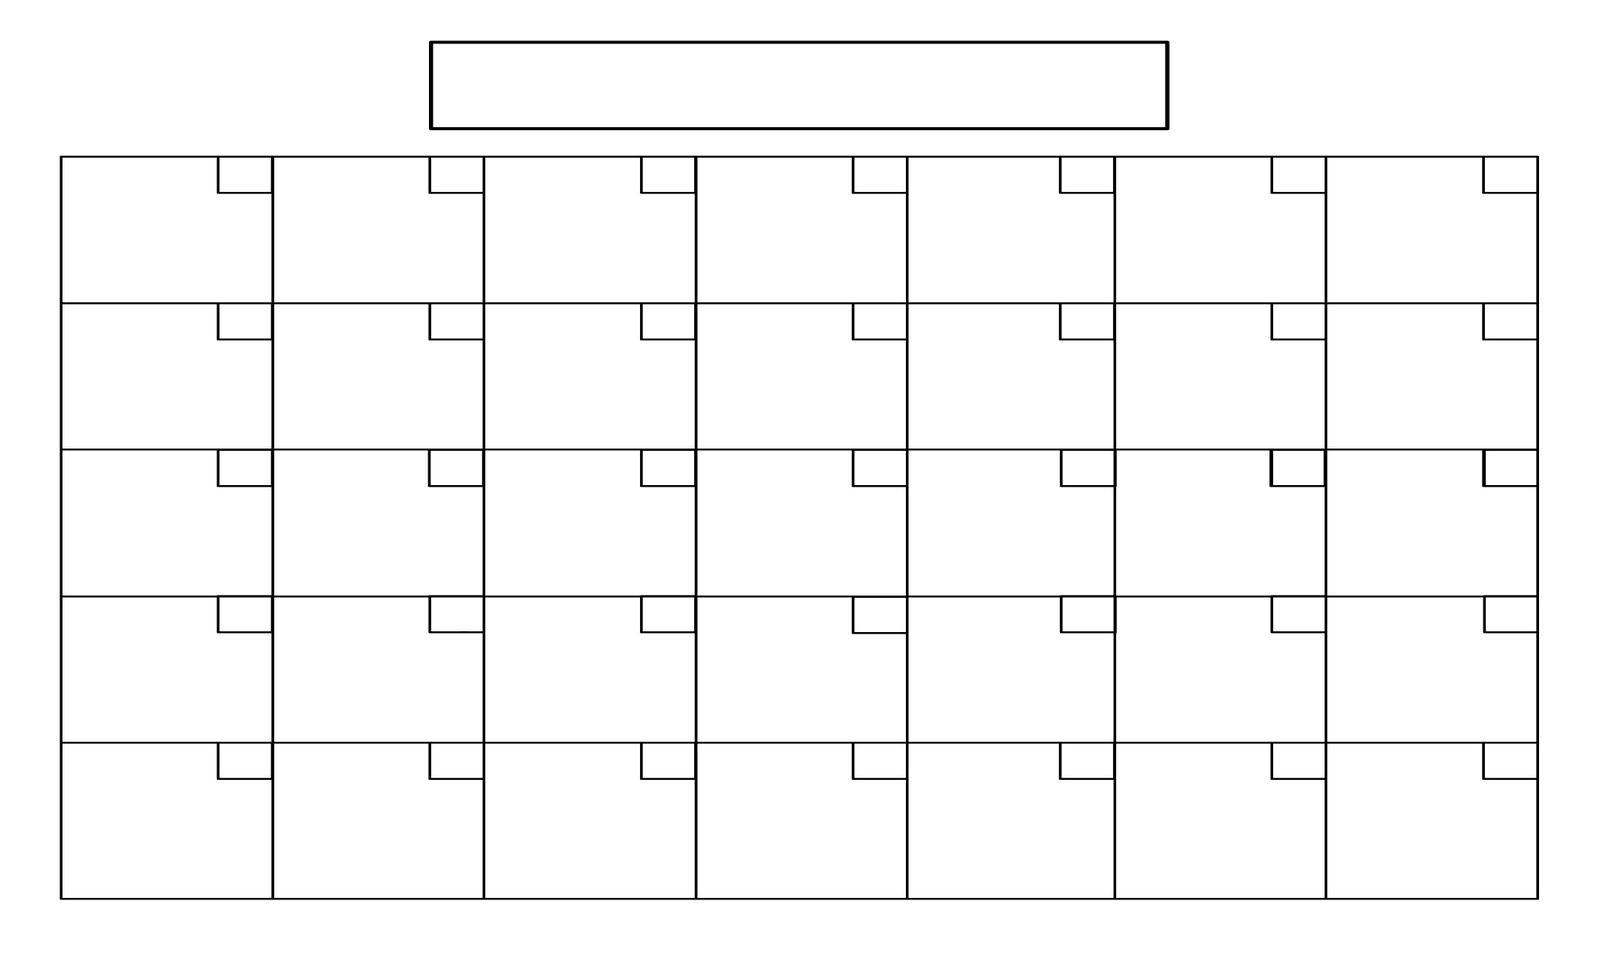 Remarkable Blank Calendar Without Dates | Blank Calendar